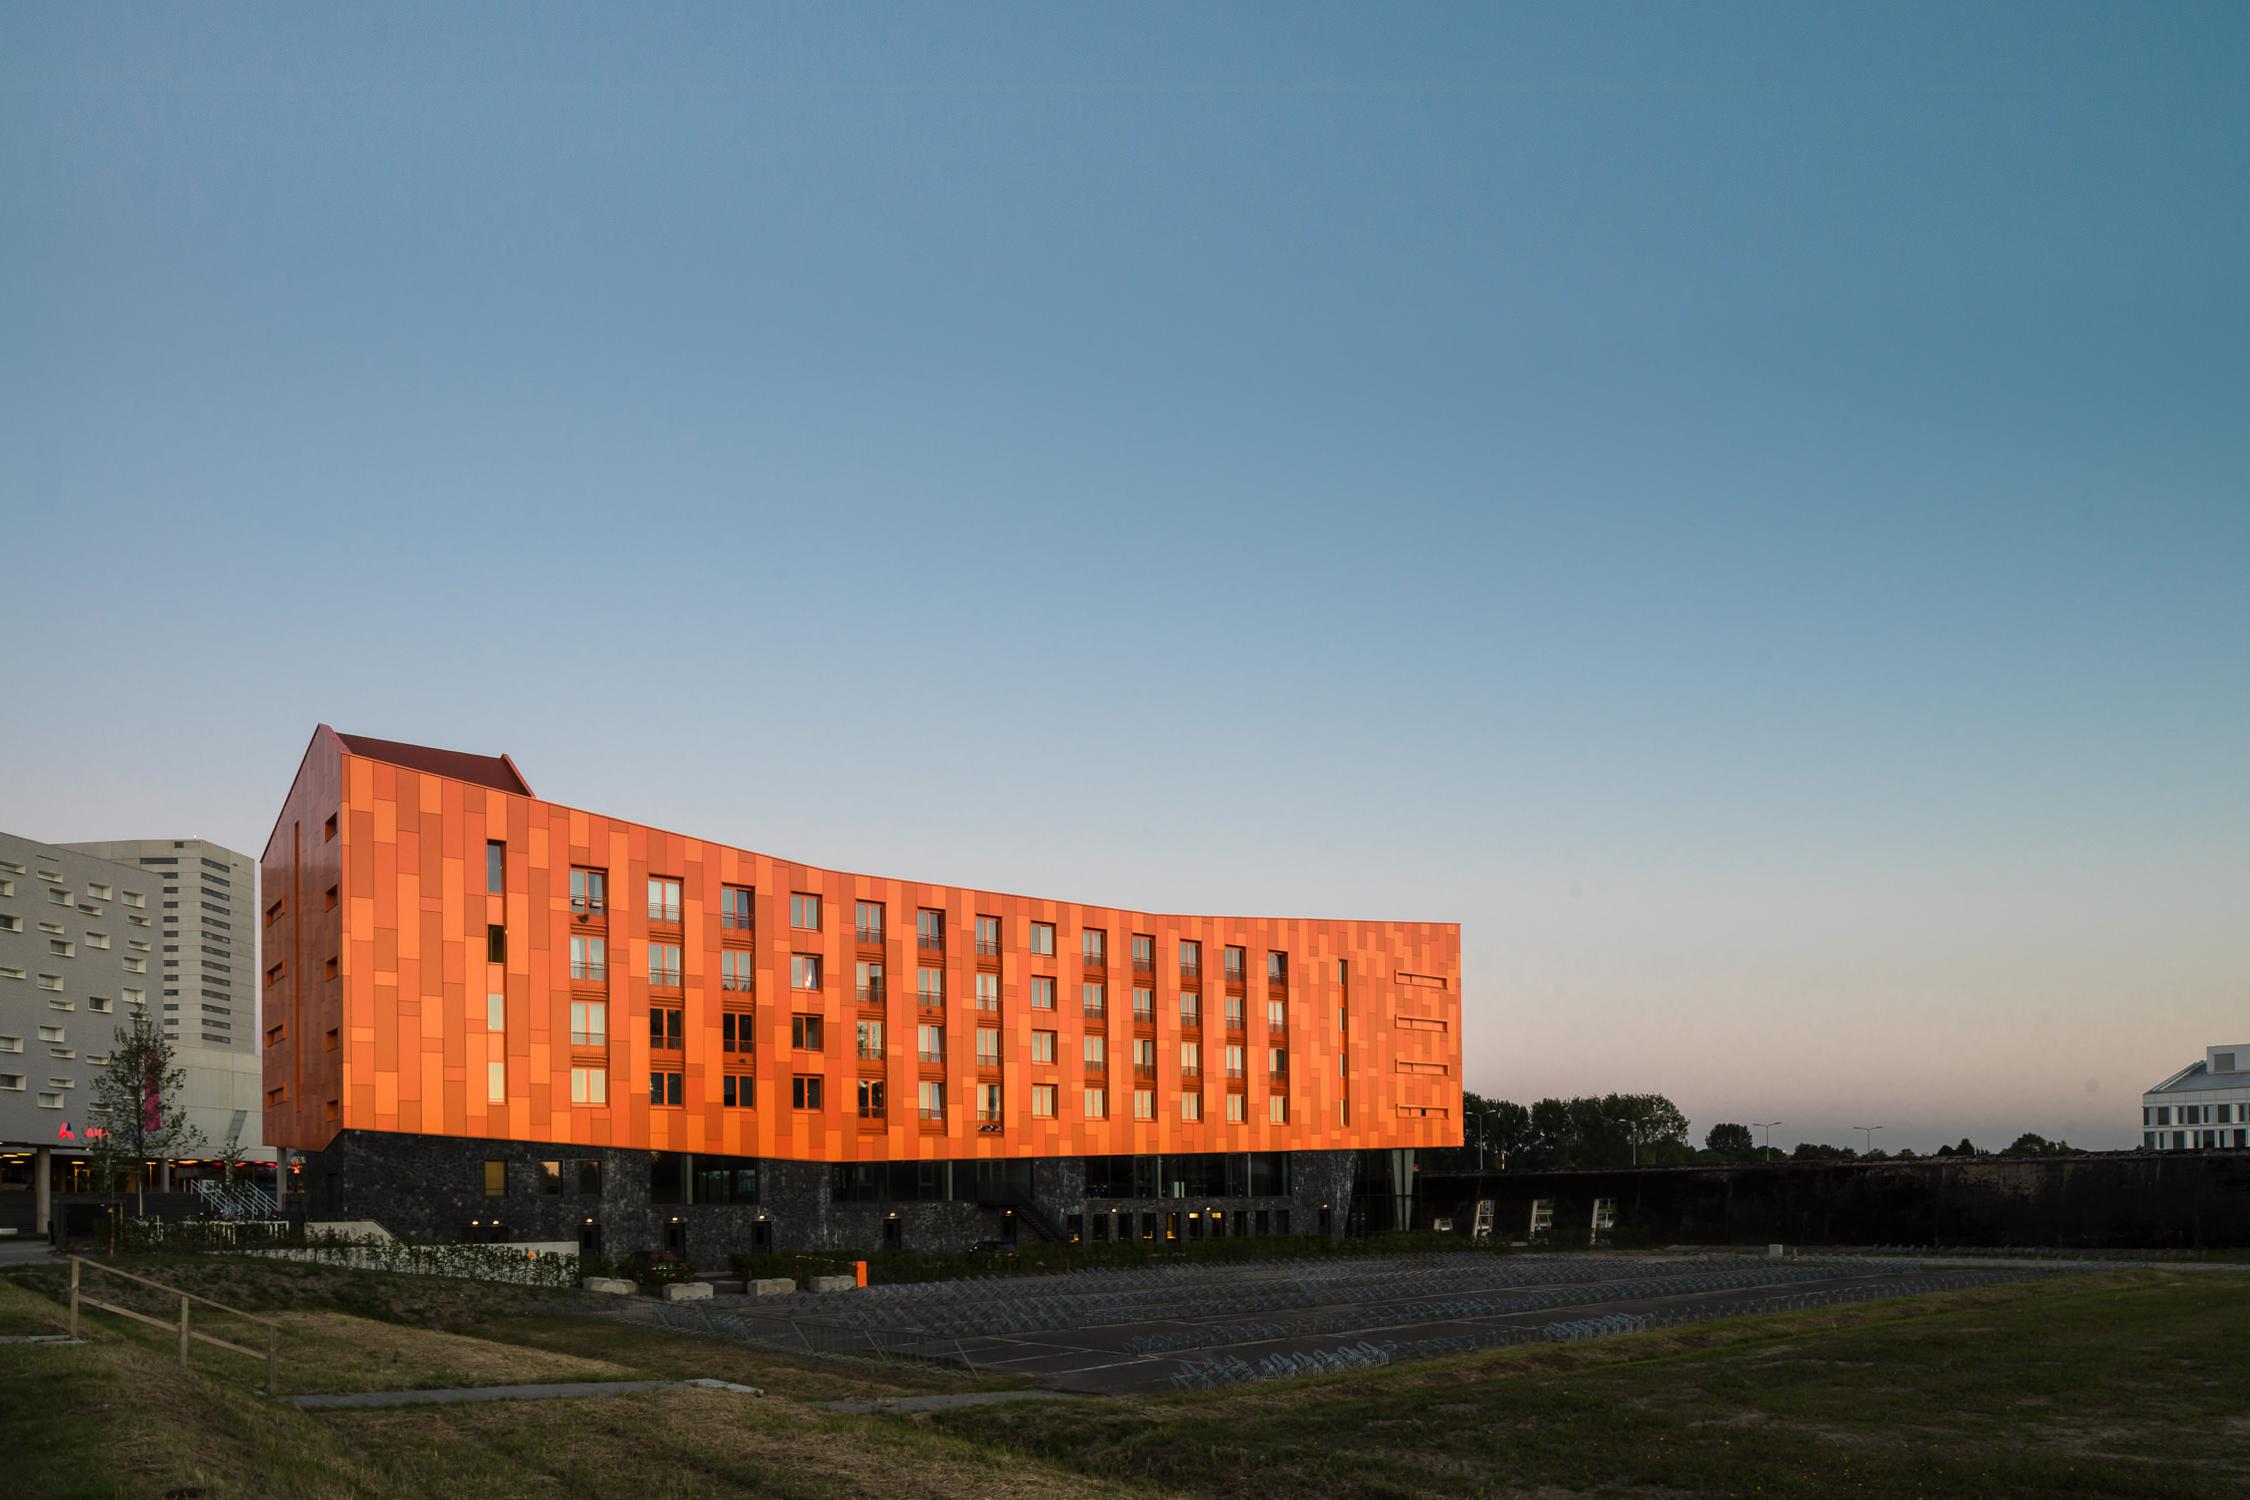 Mark hadden architecture photography - hete kolen by team 4 architecten